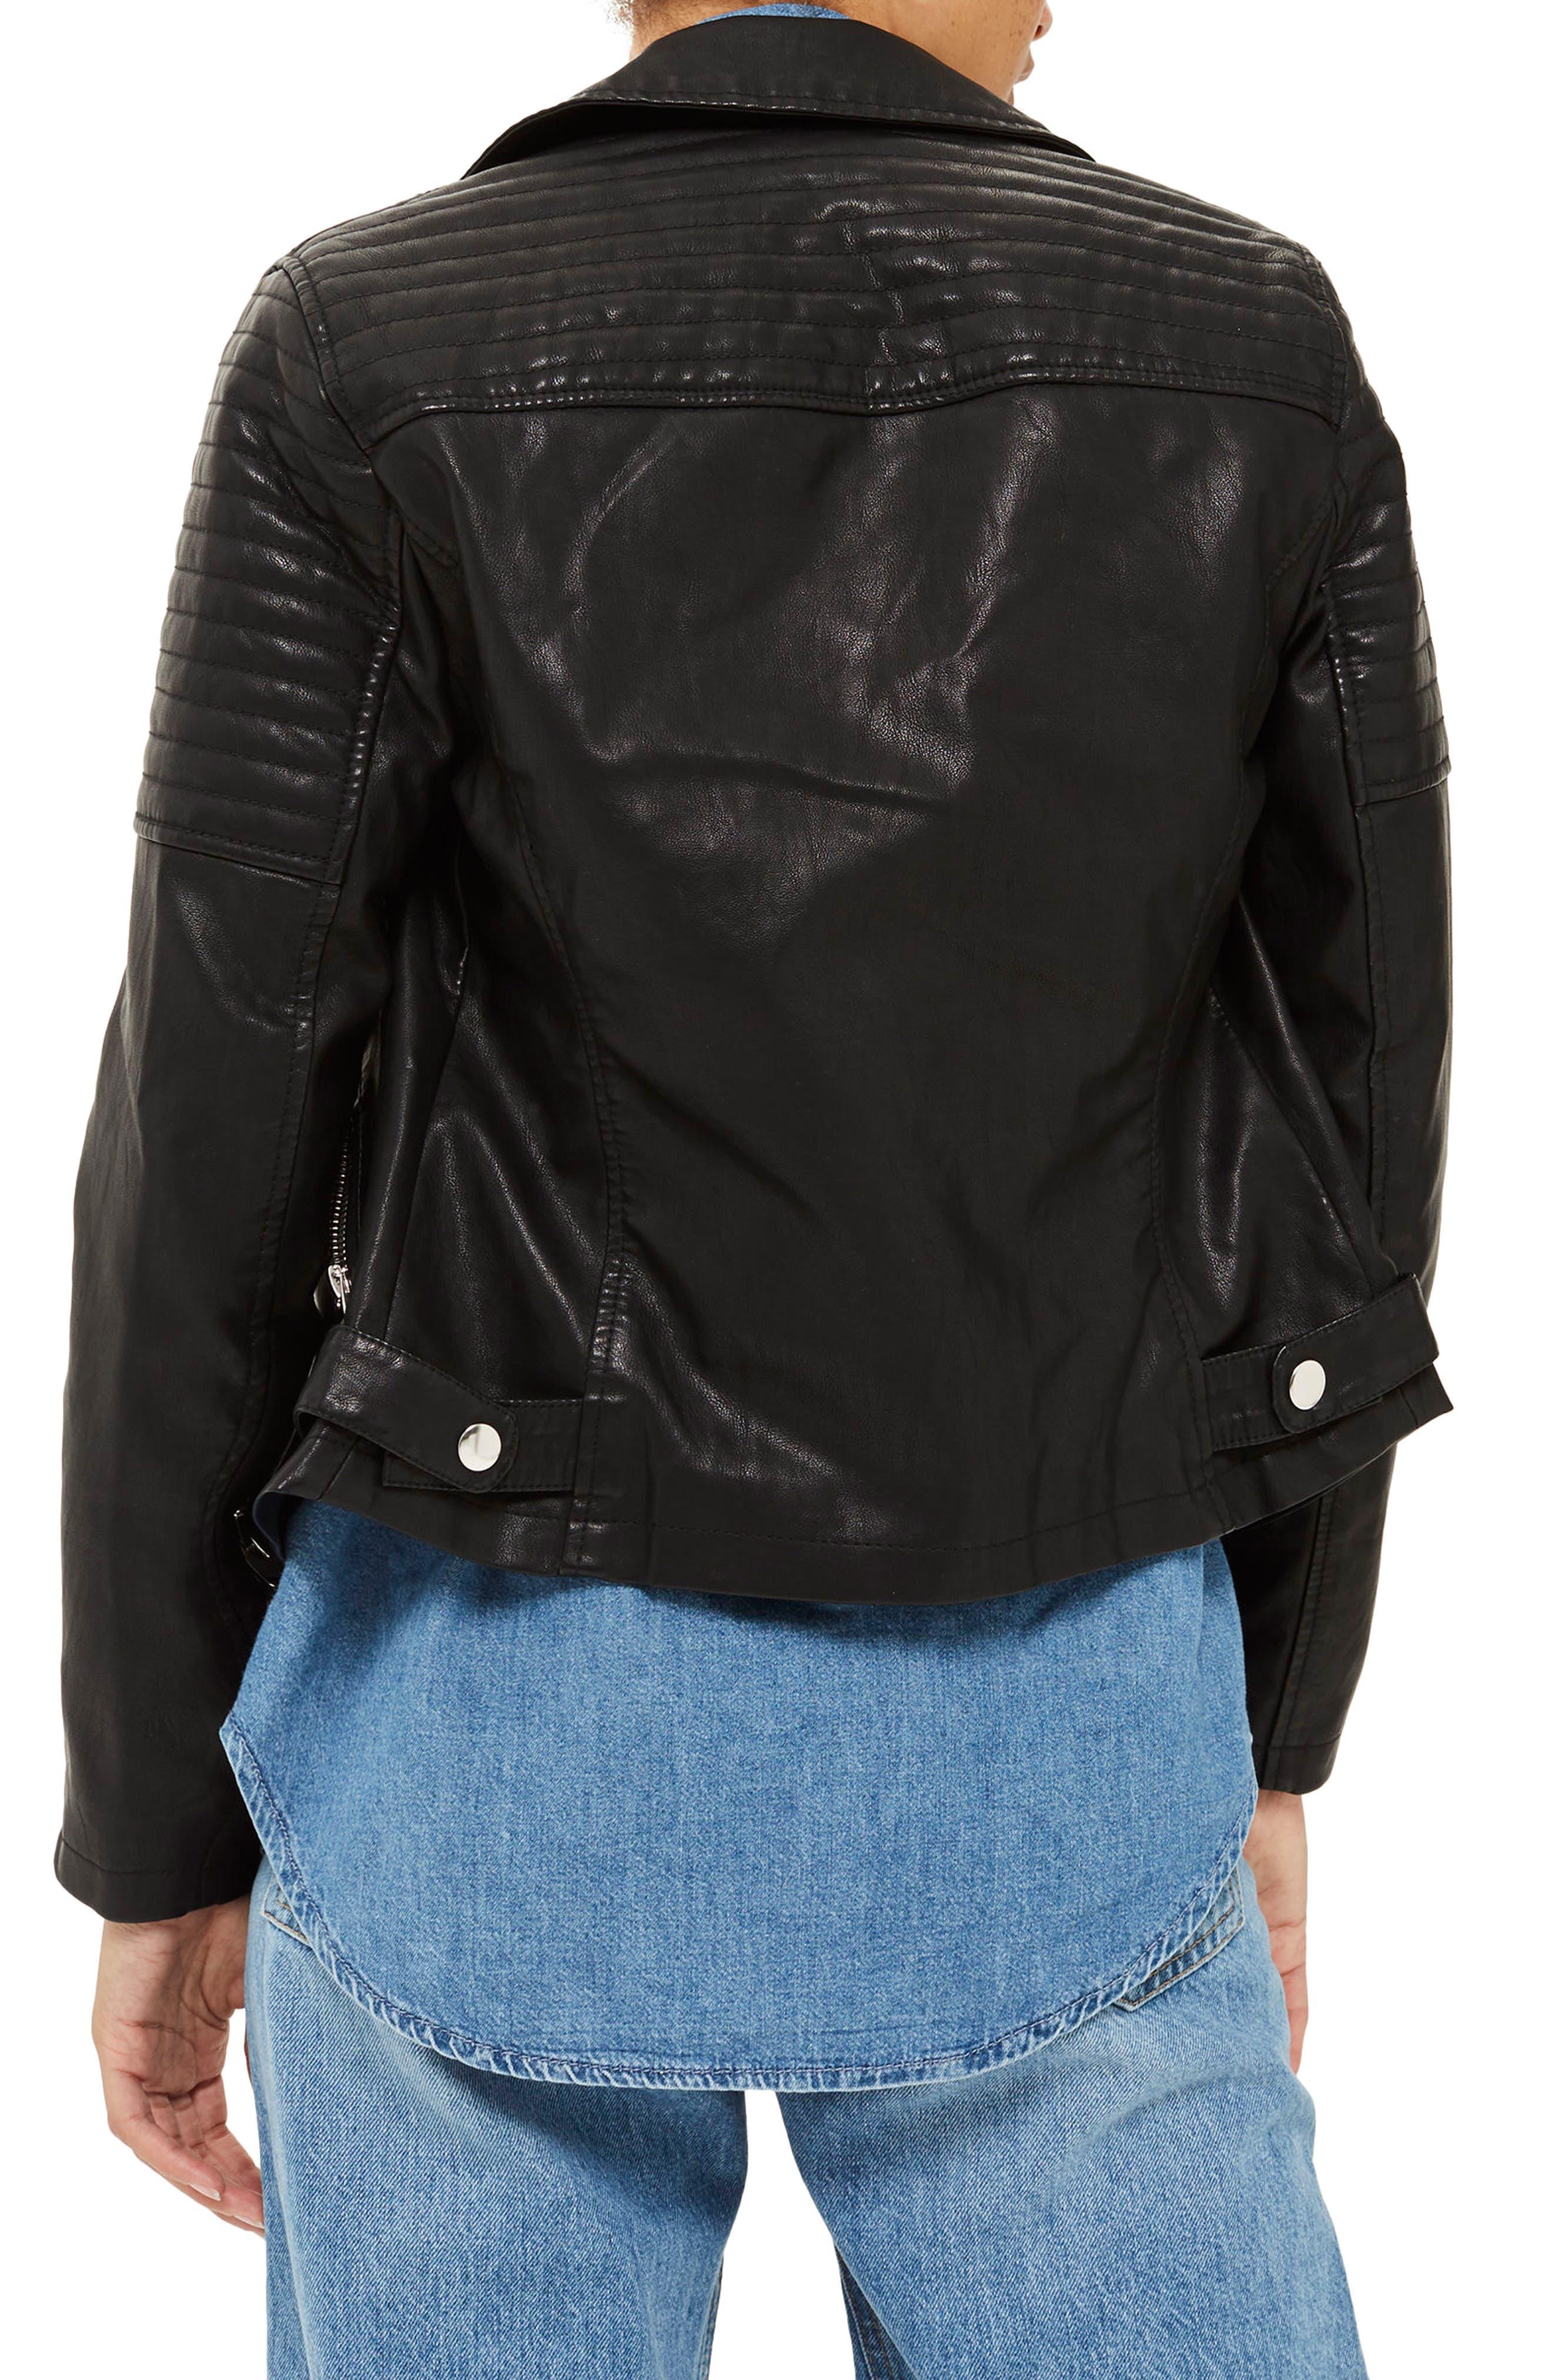 TOPSHOP, Blossom Faux Leather Biker Jacket, Alternate thumbnail 2, color, 001